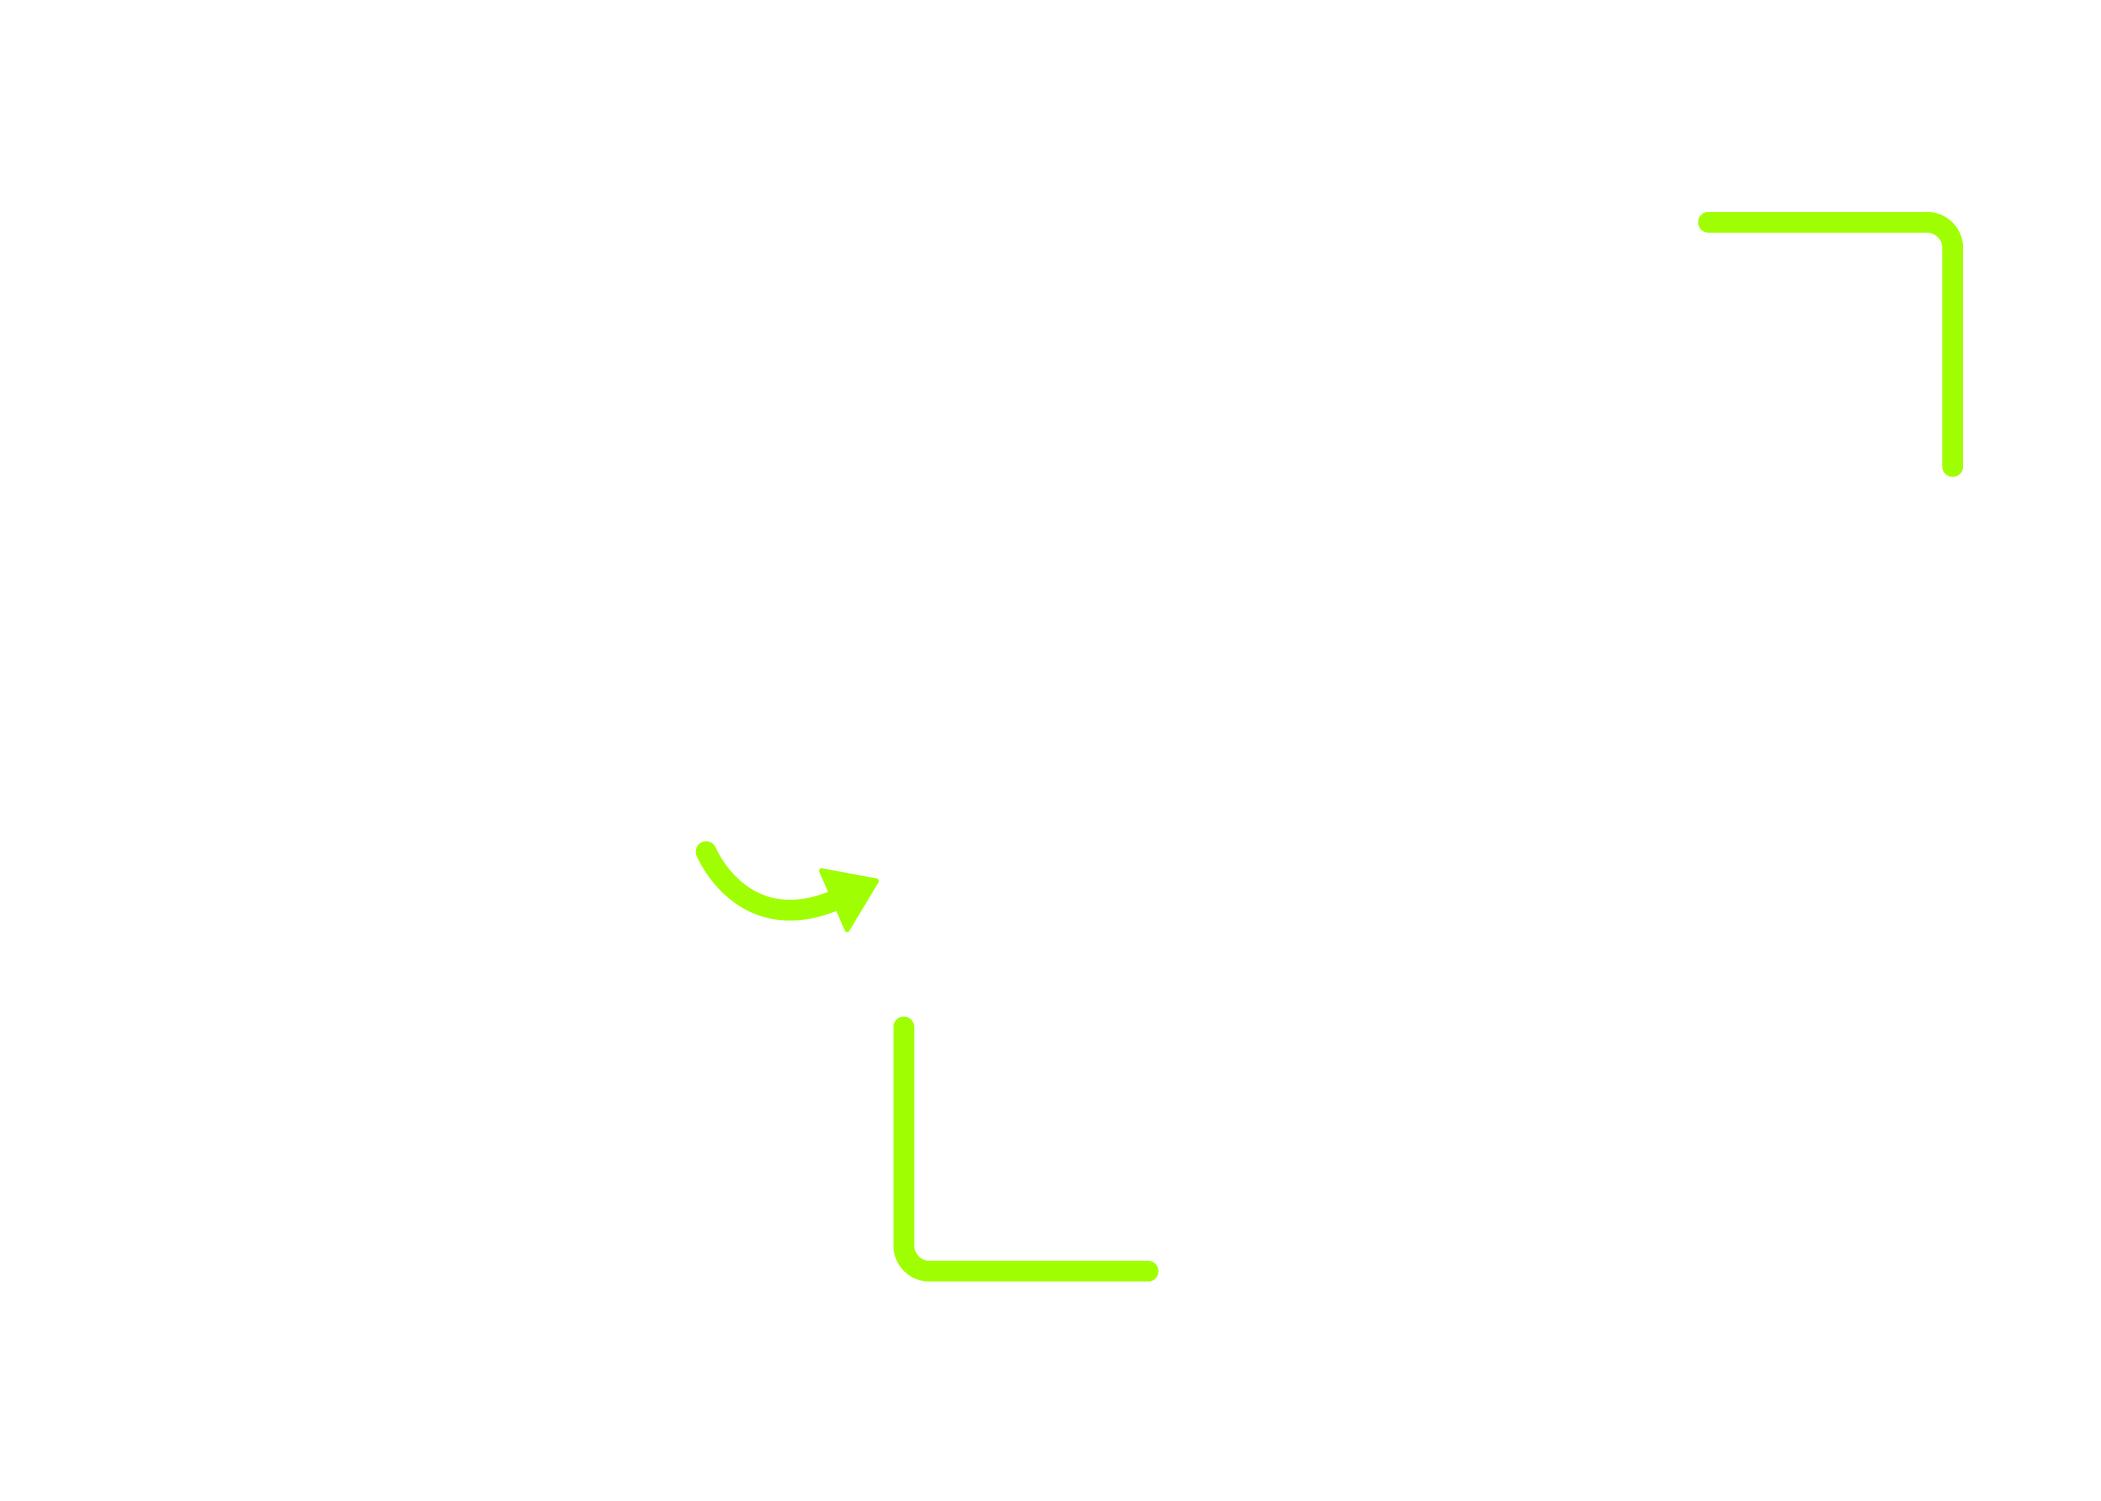 blank horizontal QR code template